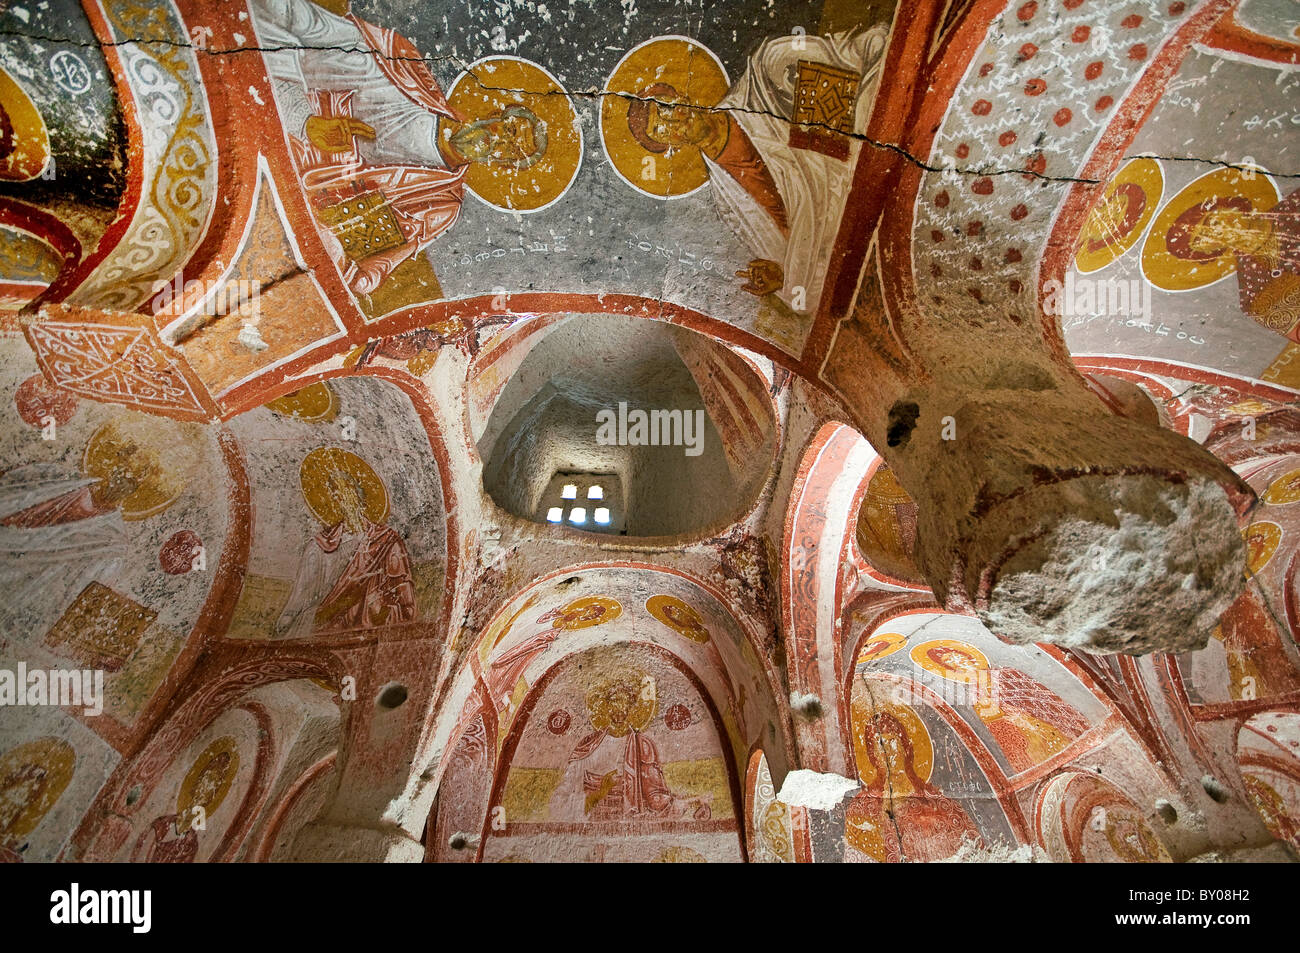 Interior view of rock carved Yusuf Koc Church Cappadocia Turkey - Stock Image